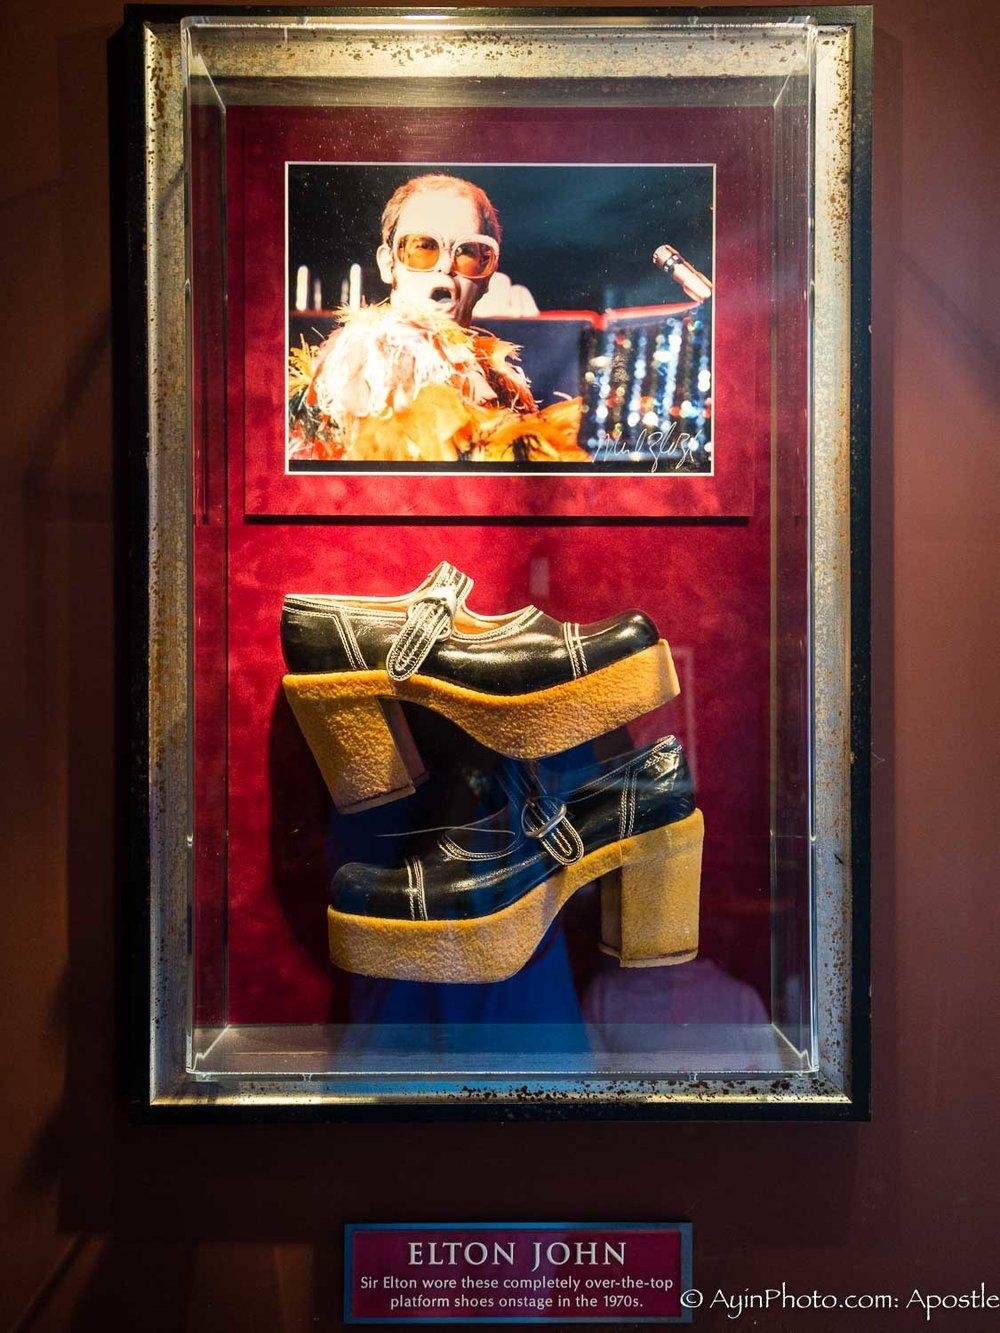 Elton John Shoe 1970-3100.jpg